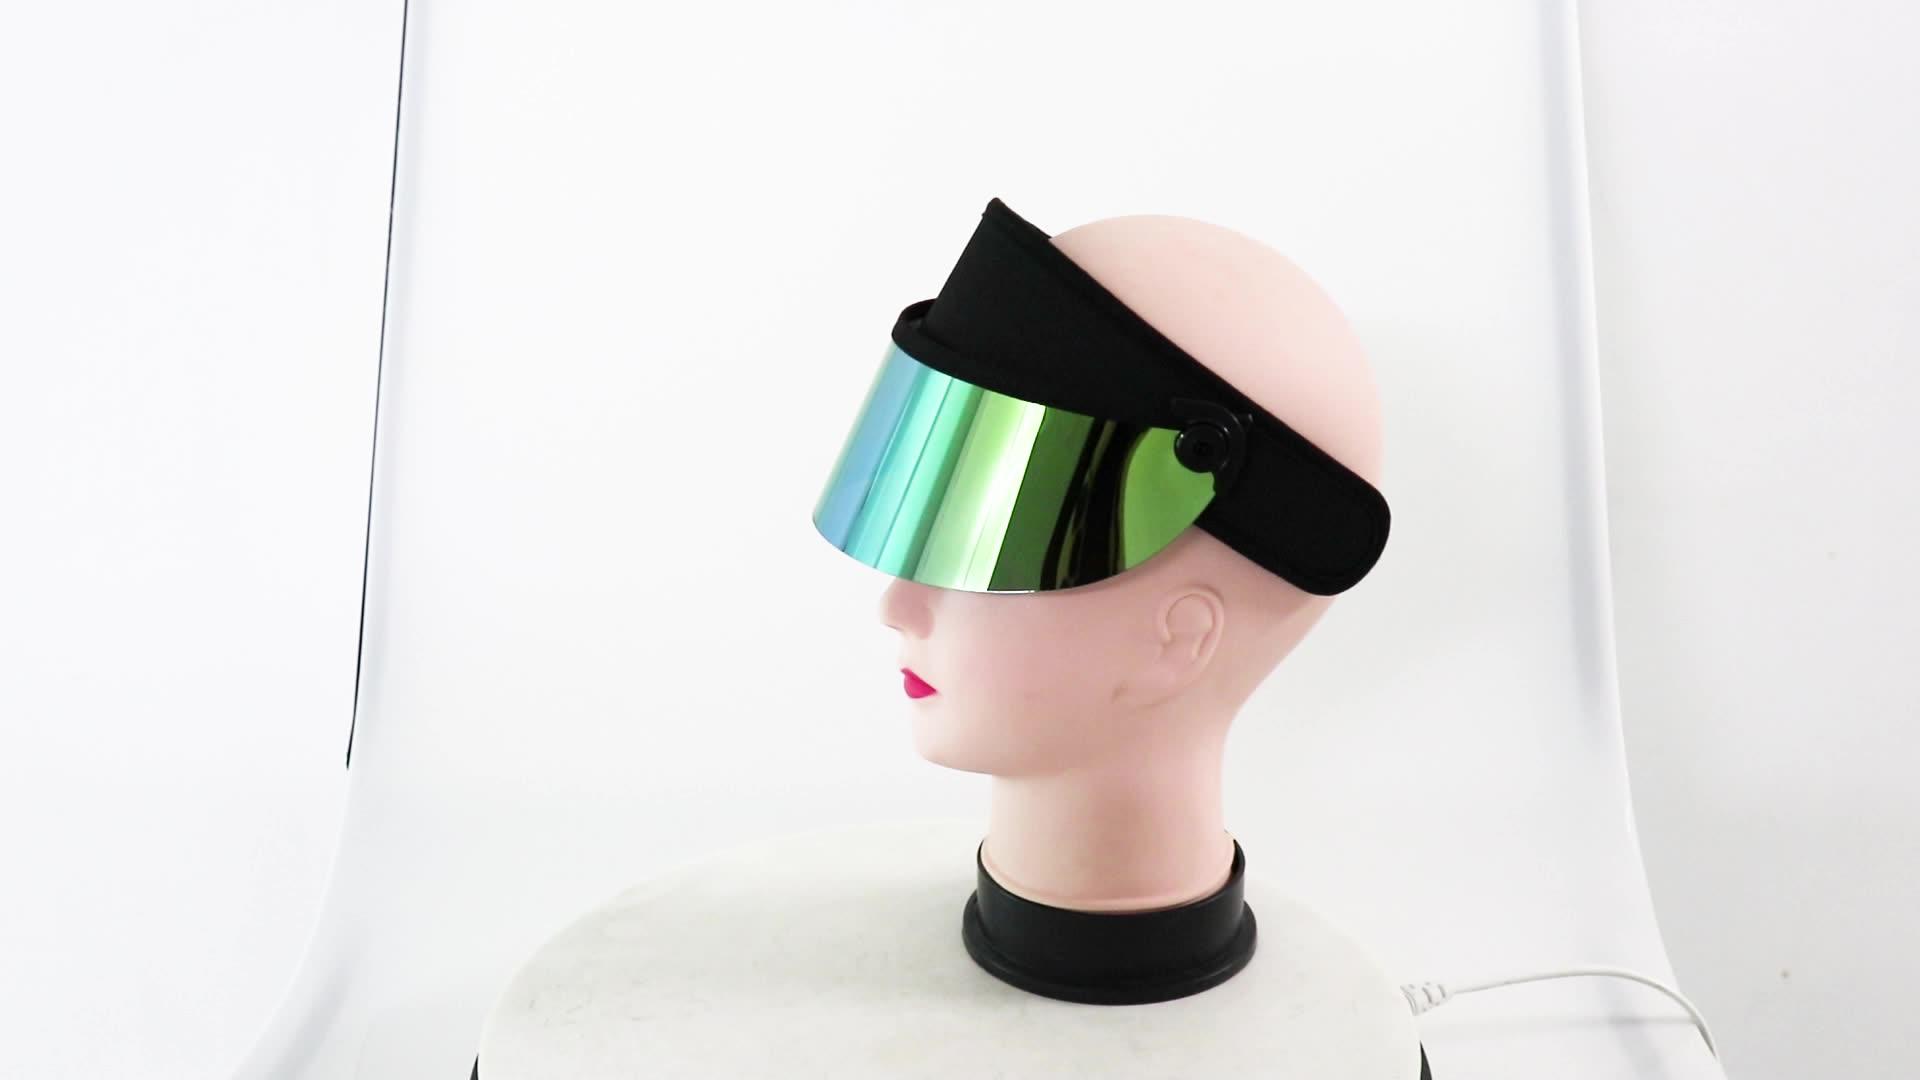 Scratch Resistance Sport Visor UV Protection PC Sun Visor Cap face Visor hats wholesale